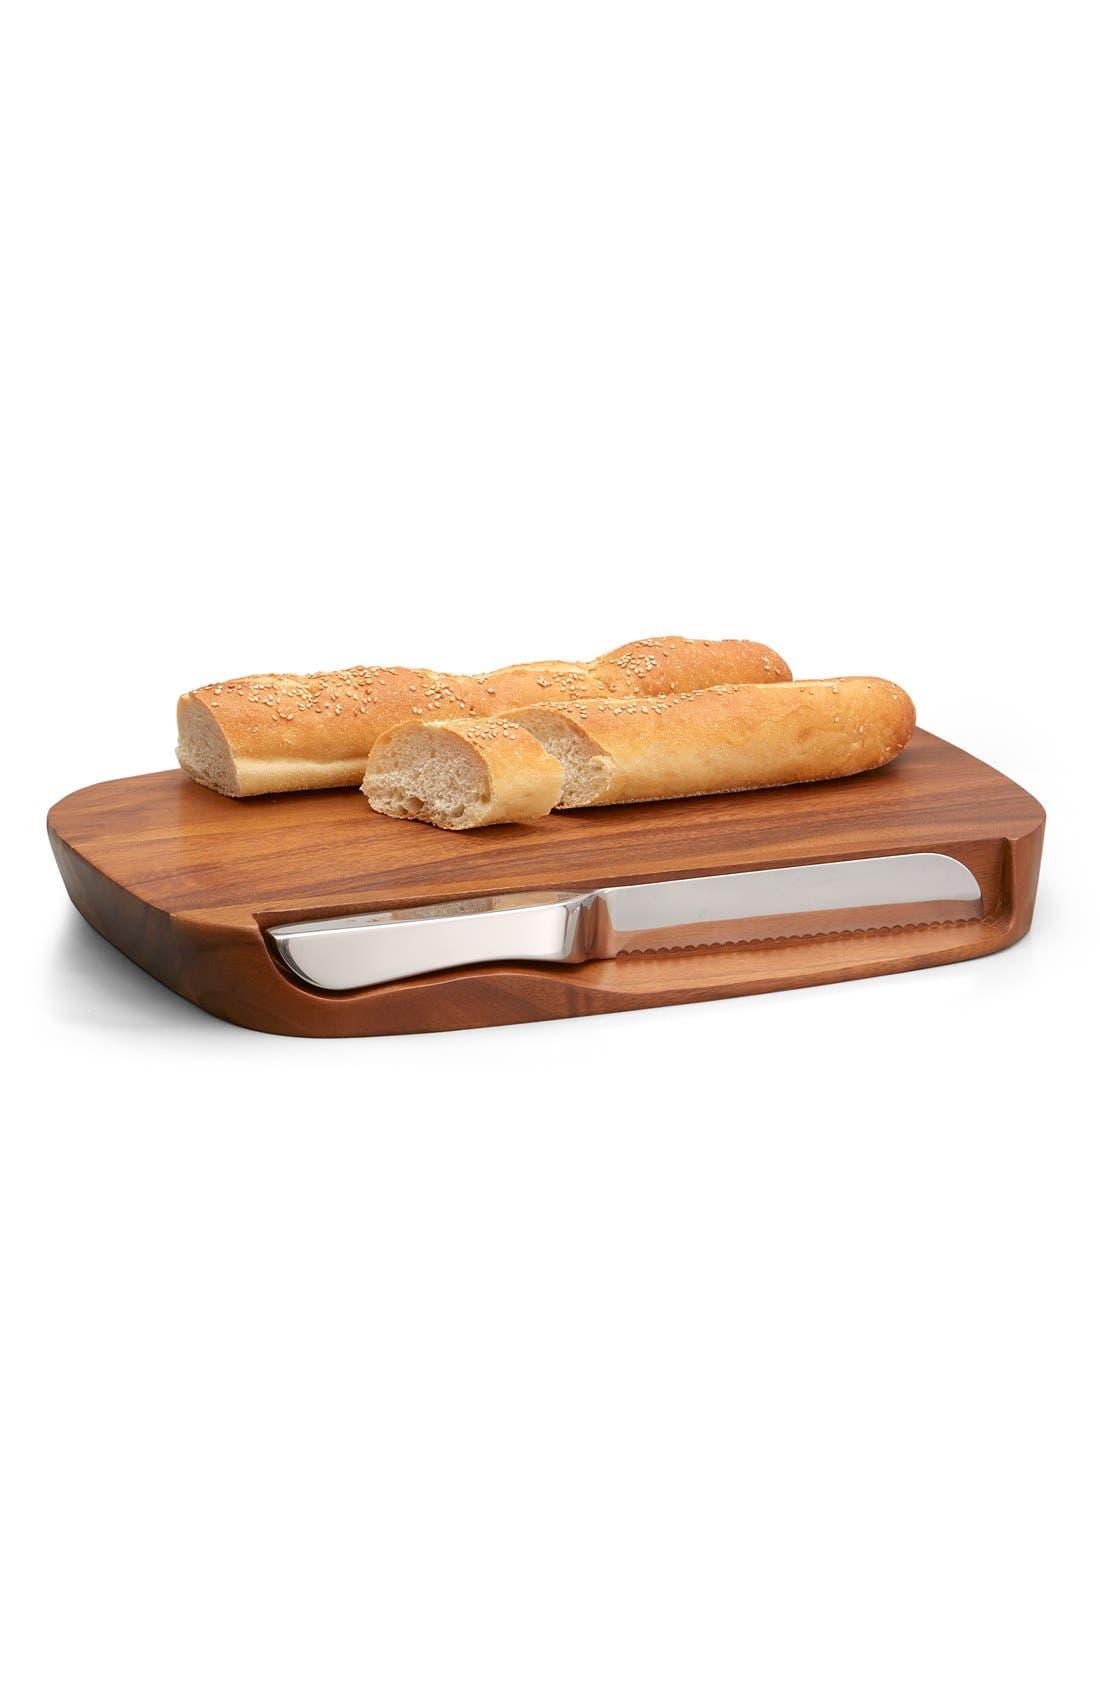 'Blend' Bread Board & Knife,                             Main thumbnail 1, color,                             200